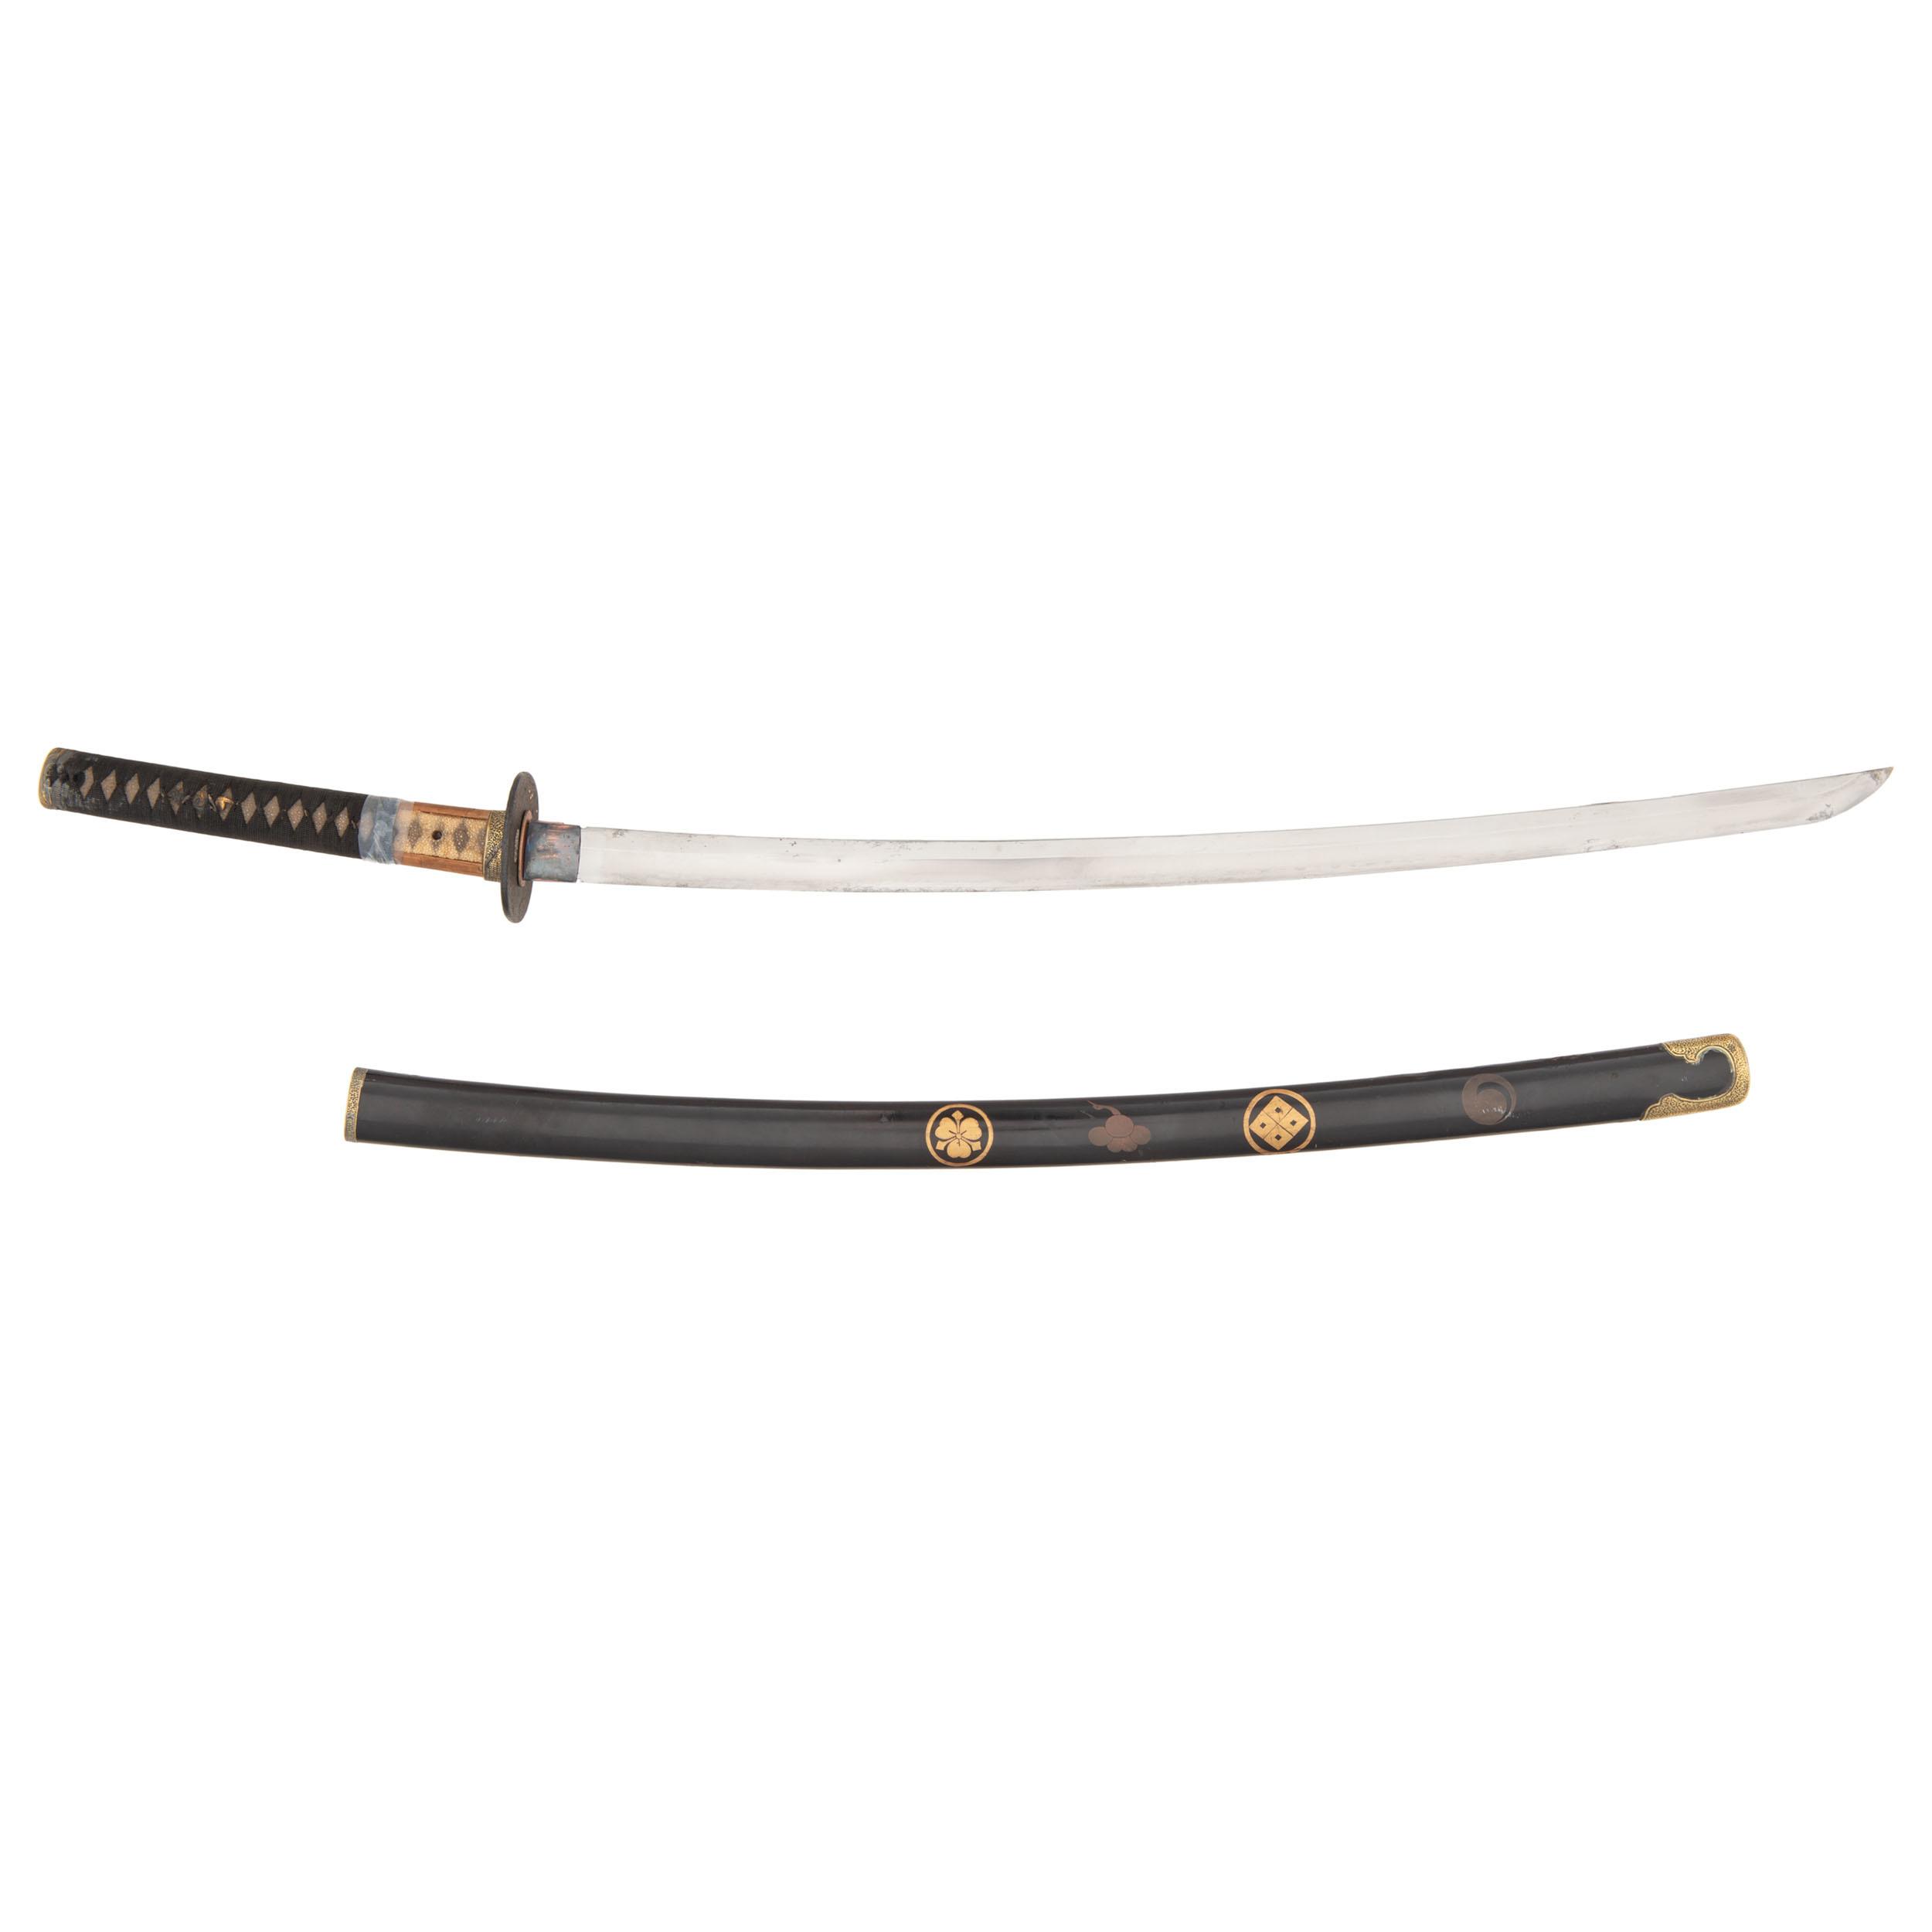 A Good Shin Shinto Period Japanese Sword Katana In Edo